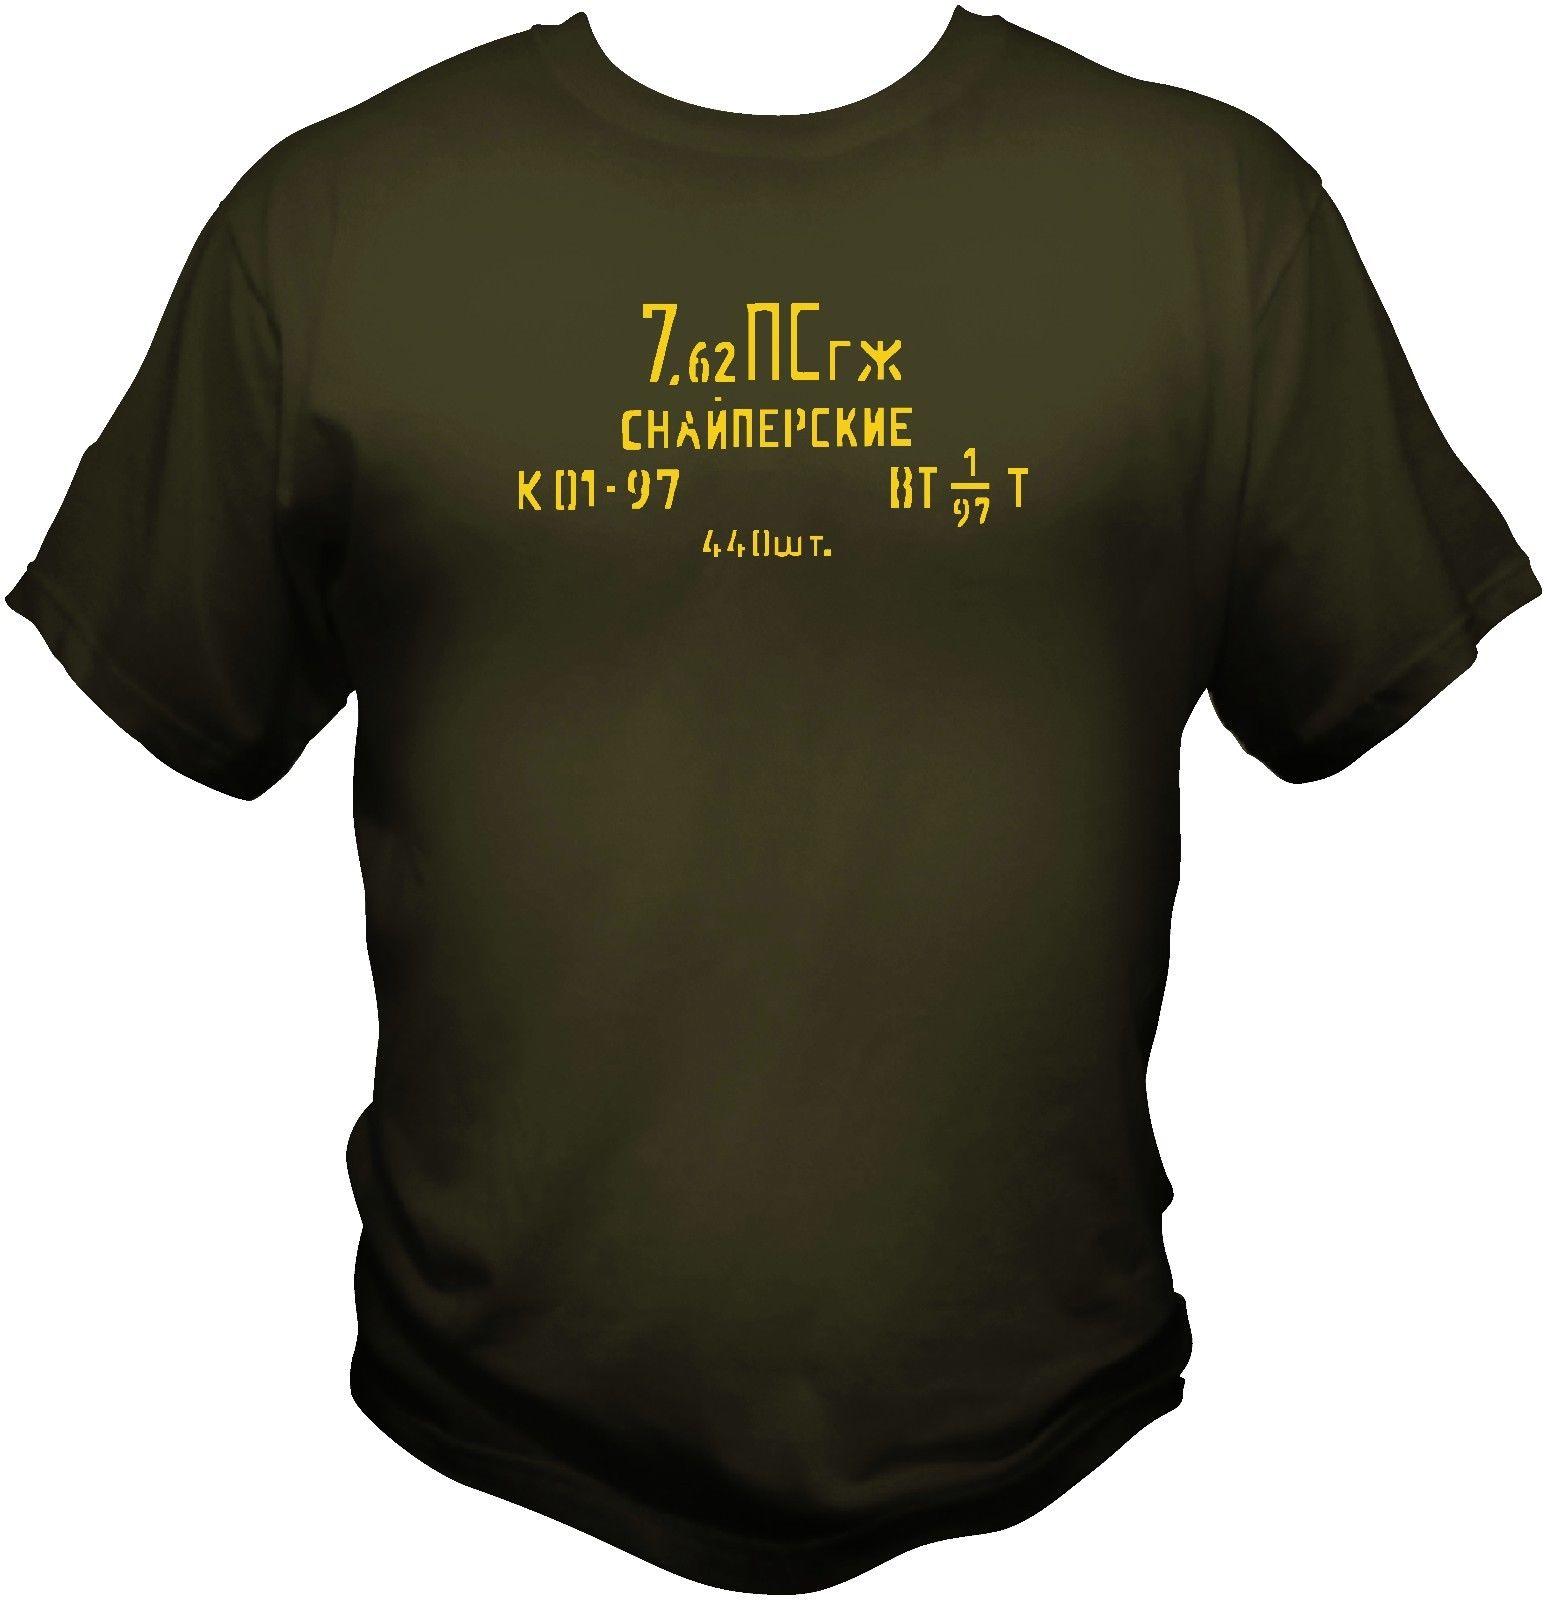 Camiseta Harajuku gran oferta para hombre, camiseta rusa 7,62X54 Mosin Nagant, caja de municiones, camiseta Sling Stock M44 M91/30 bayoneta